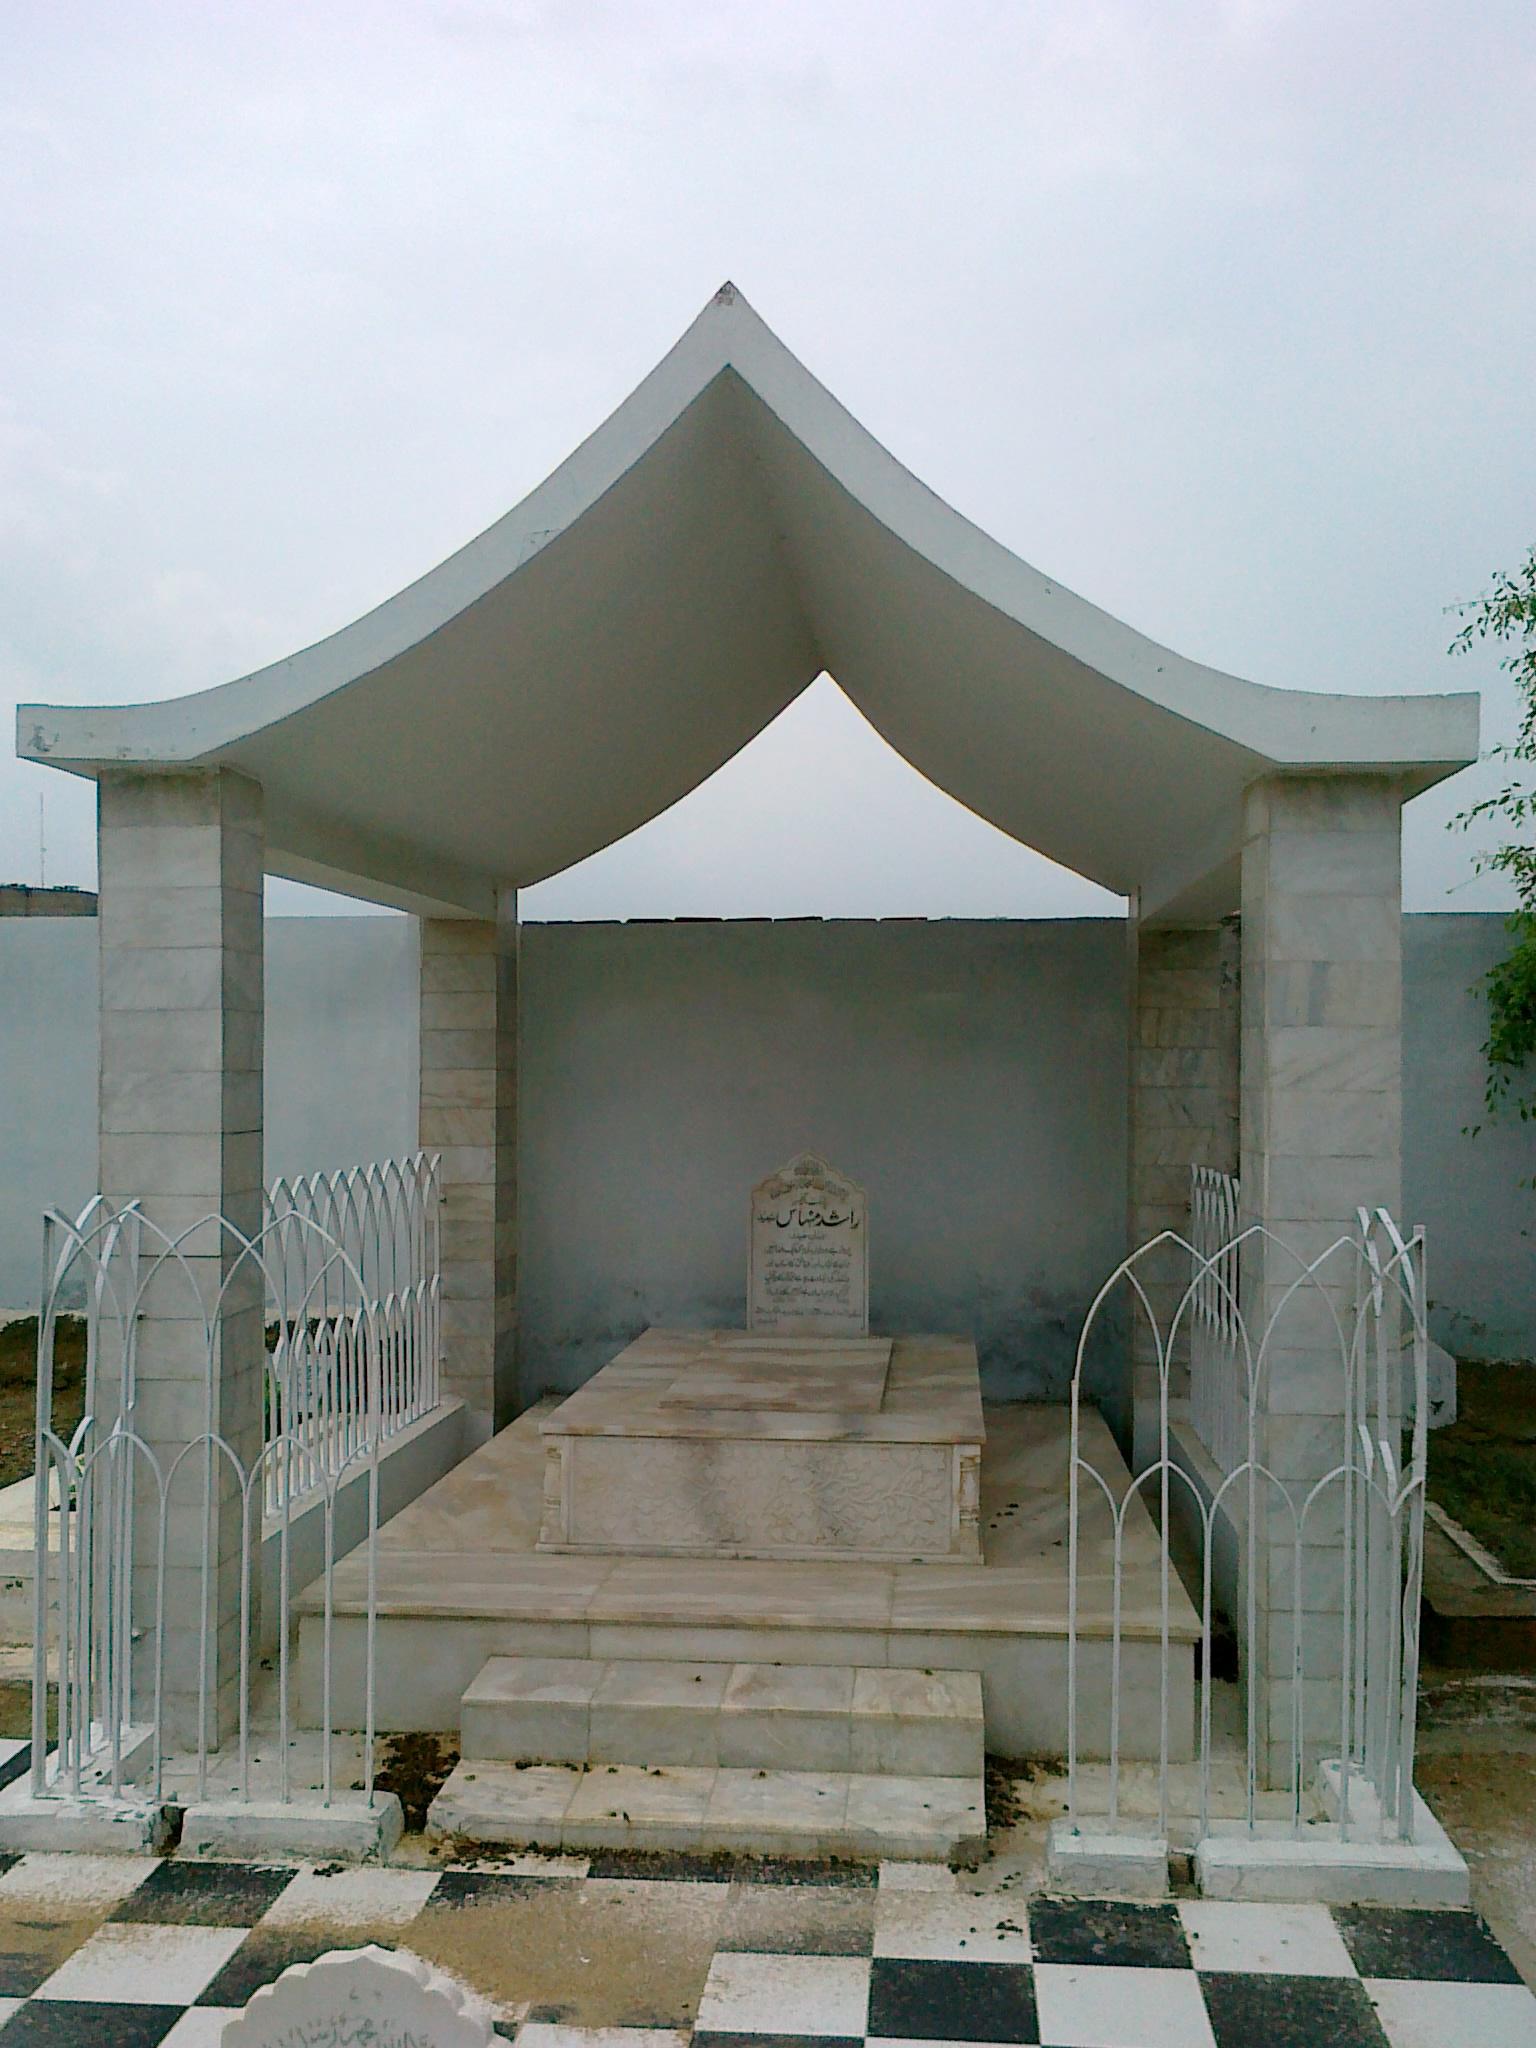 Grave of Rashid Minhas Shaheed